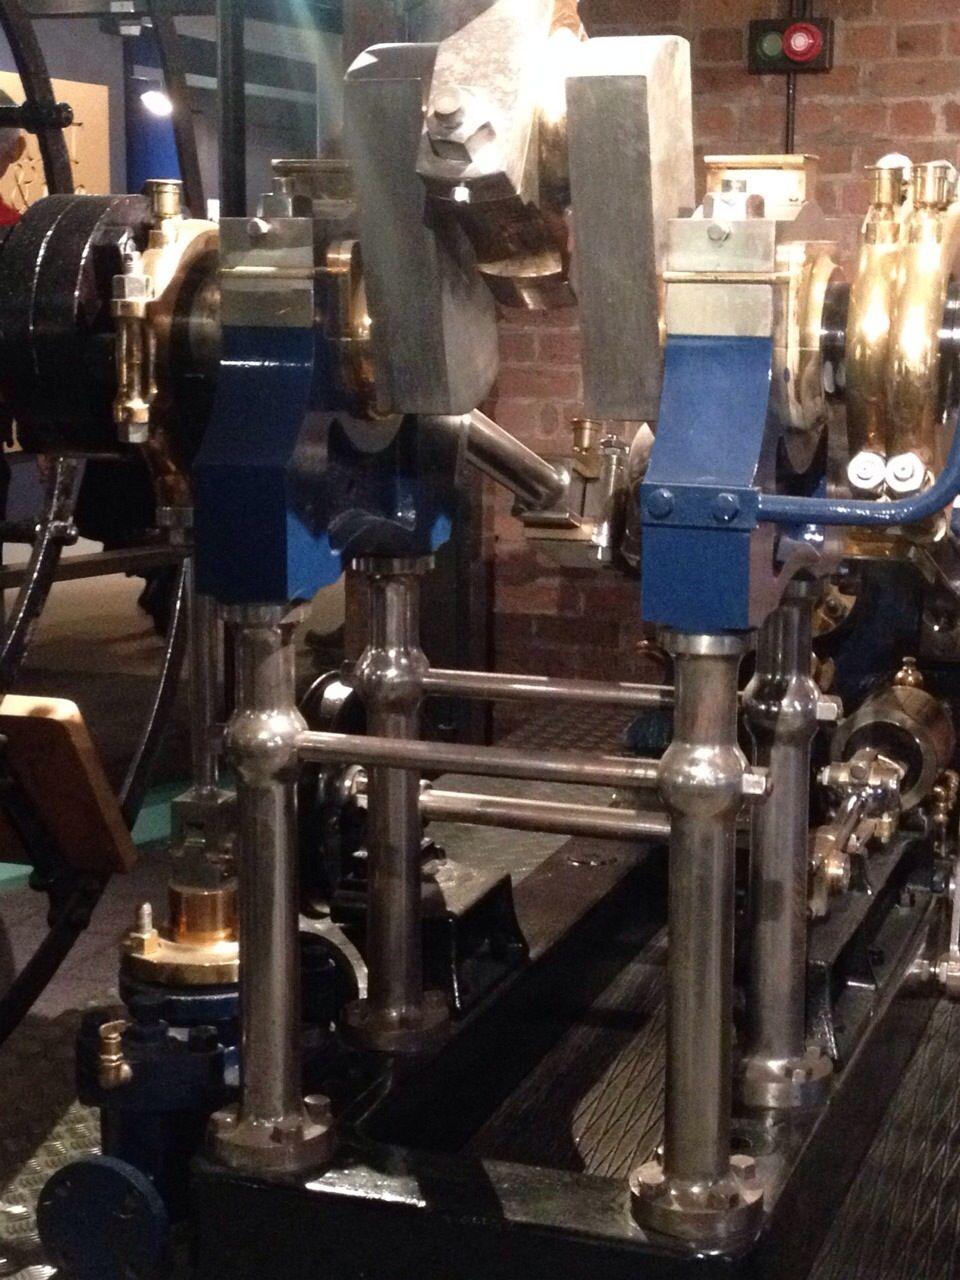 Titanic Engine Room Underwater: Titanic Ship Engine At The Museum In Albert Dock